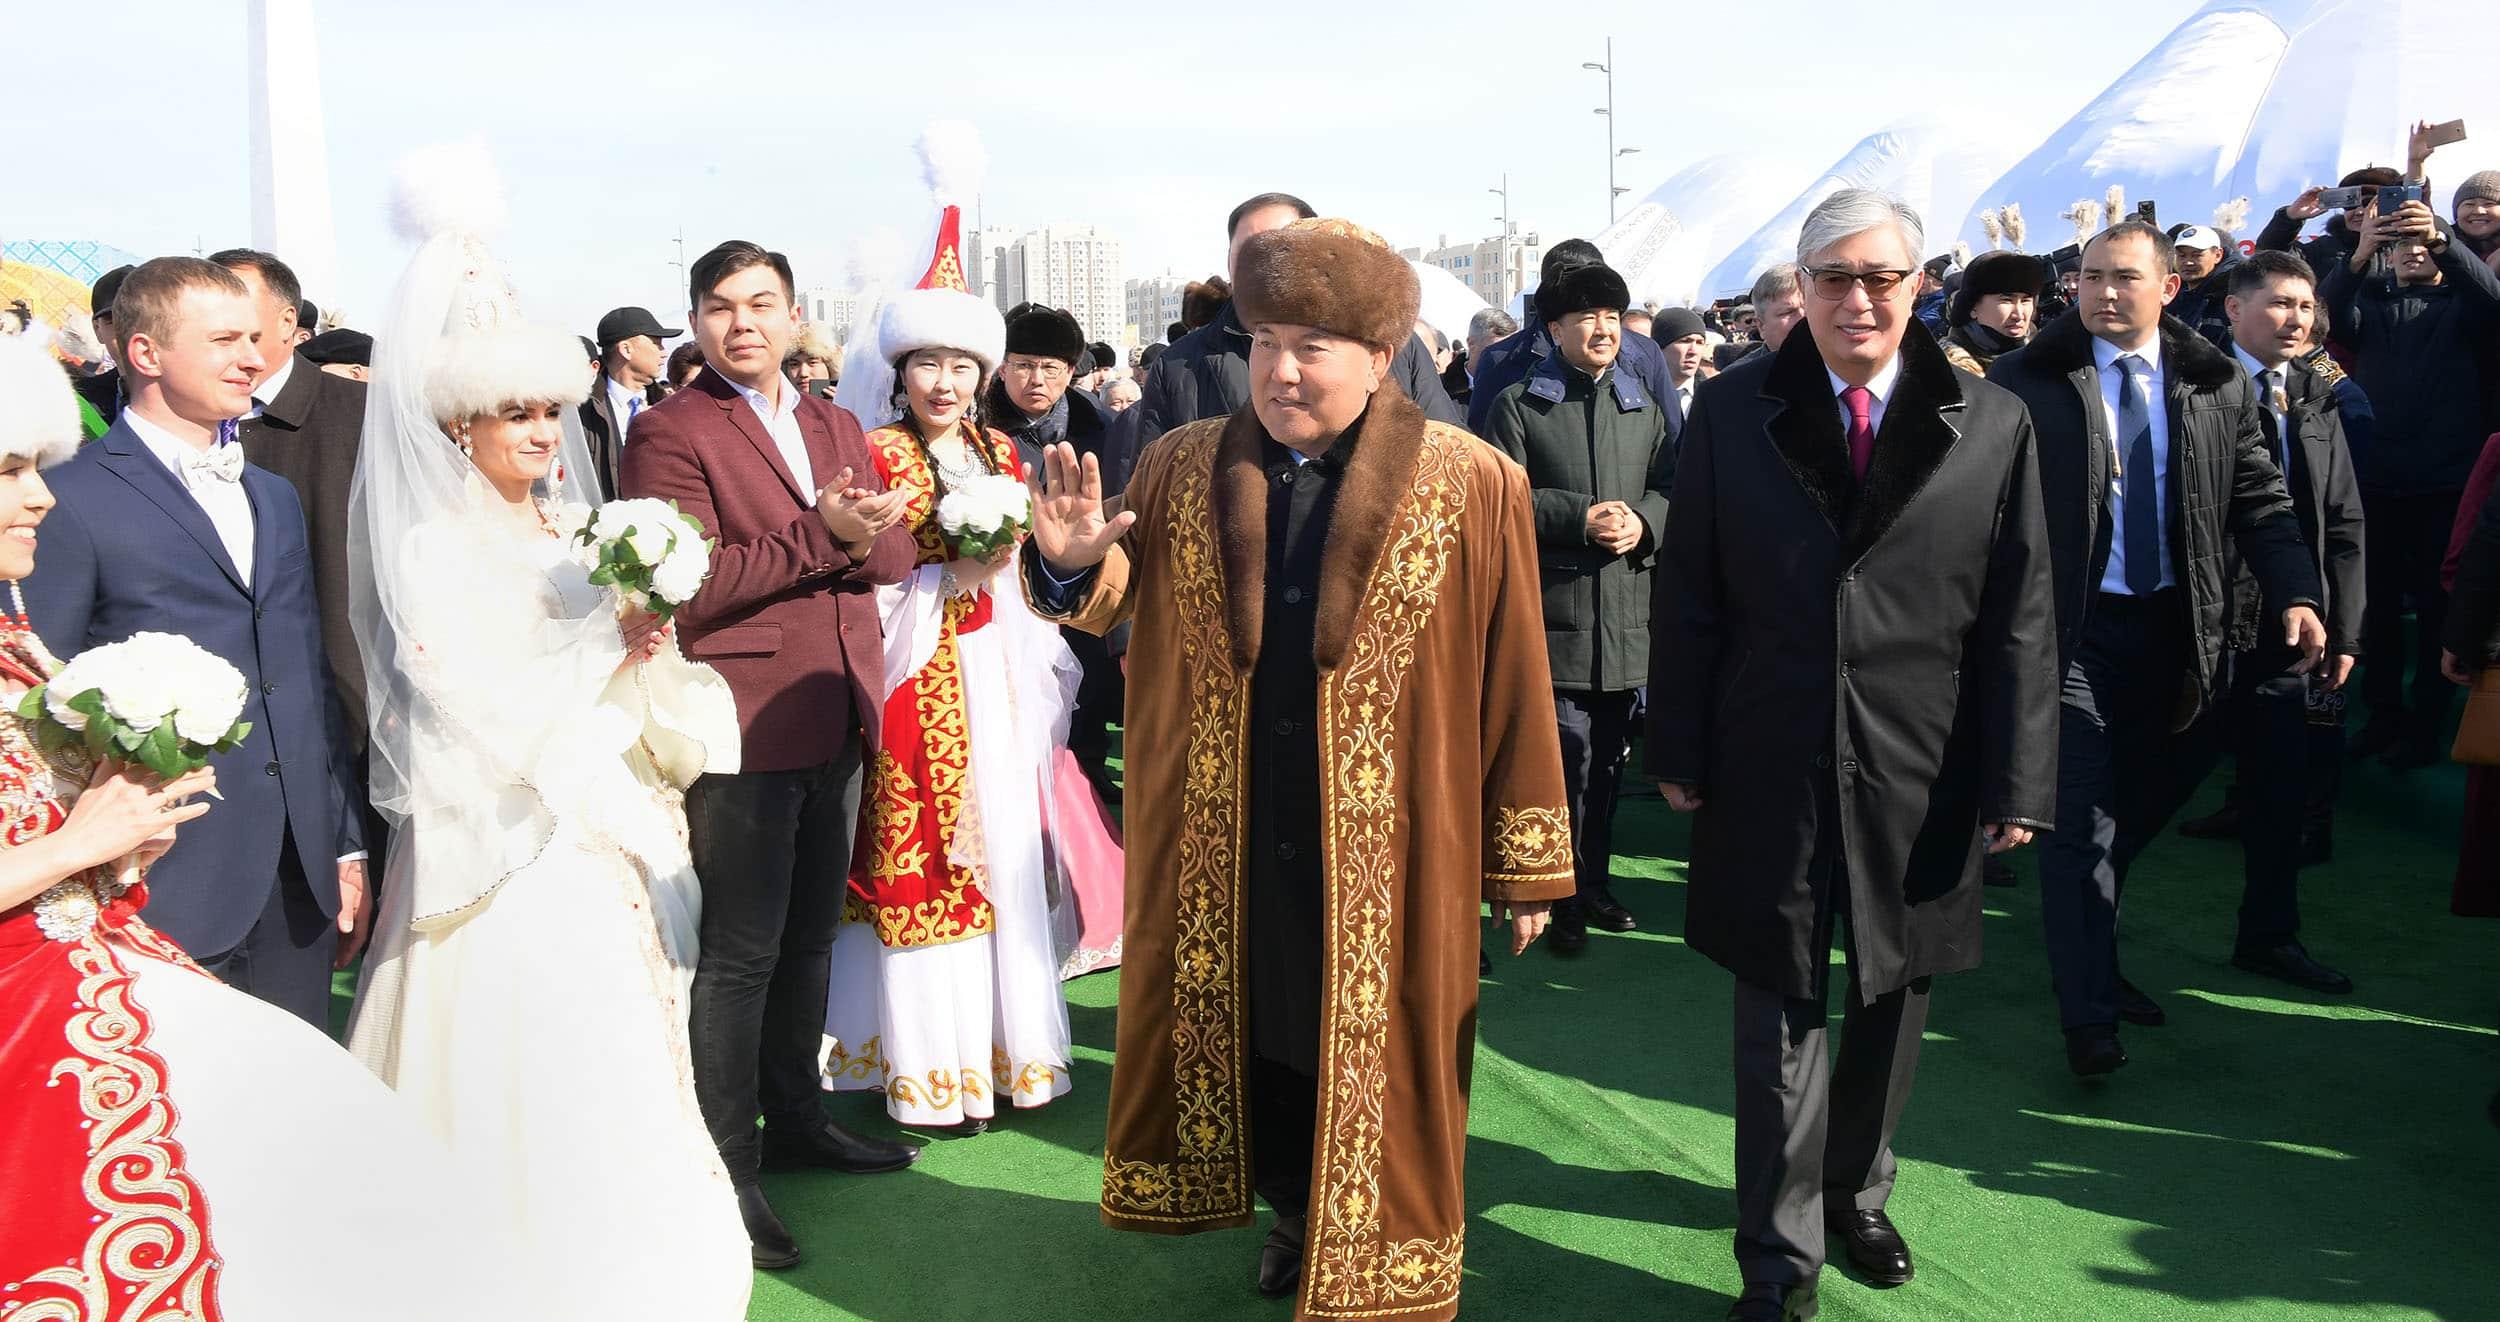 Наурыз Нұрсұлтан Назарбаев пен Қасым-Жомарт Тоқаев